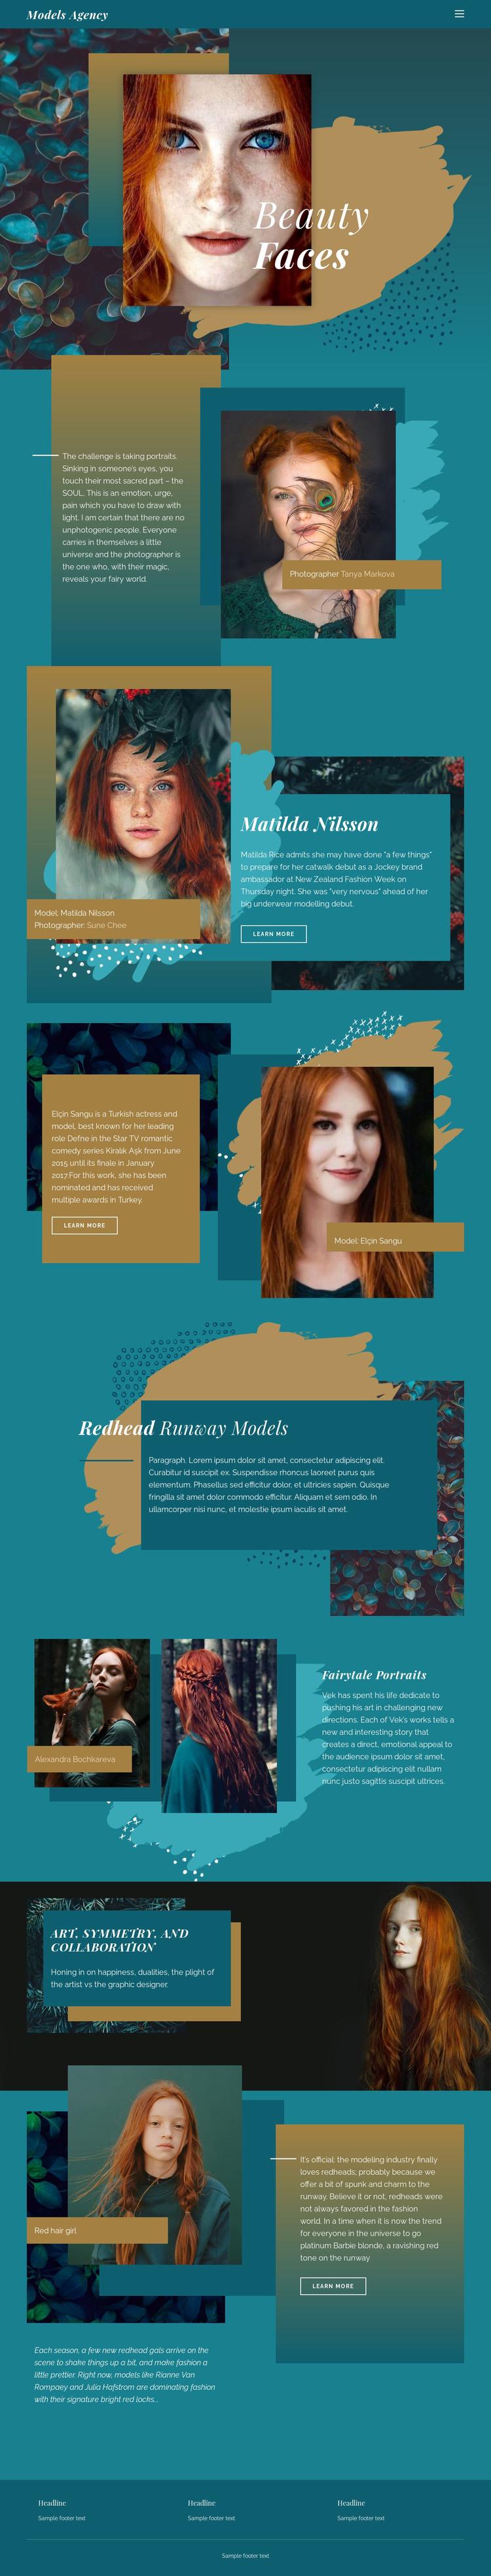 Faces of modern fashion Web Design